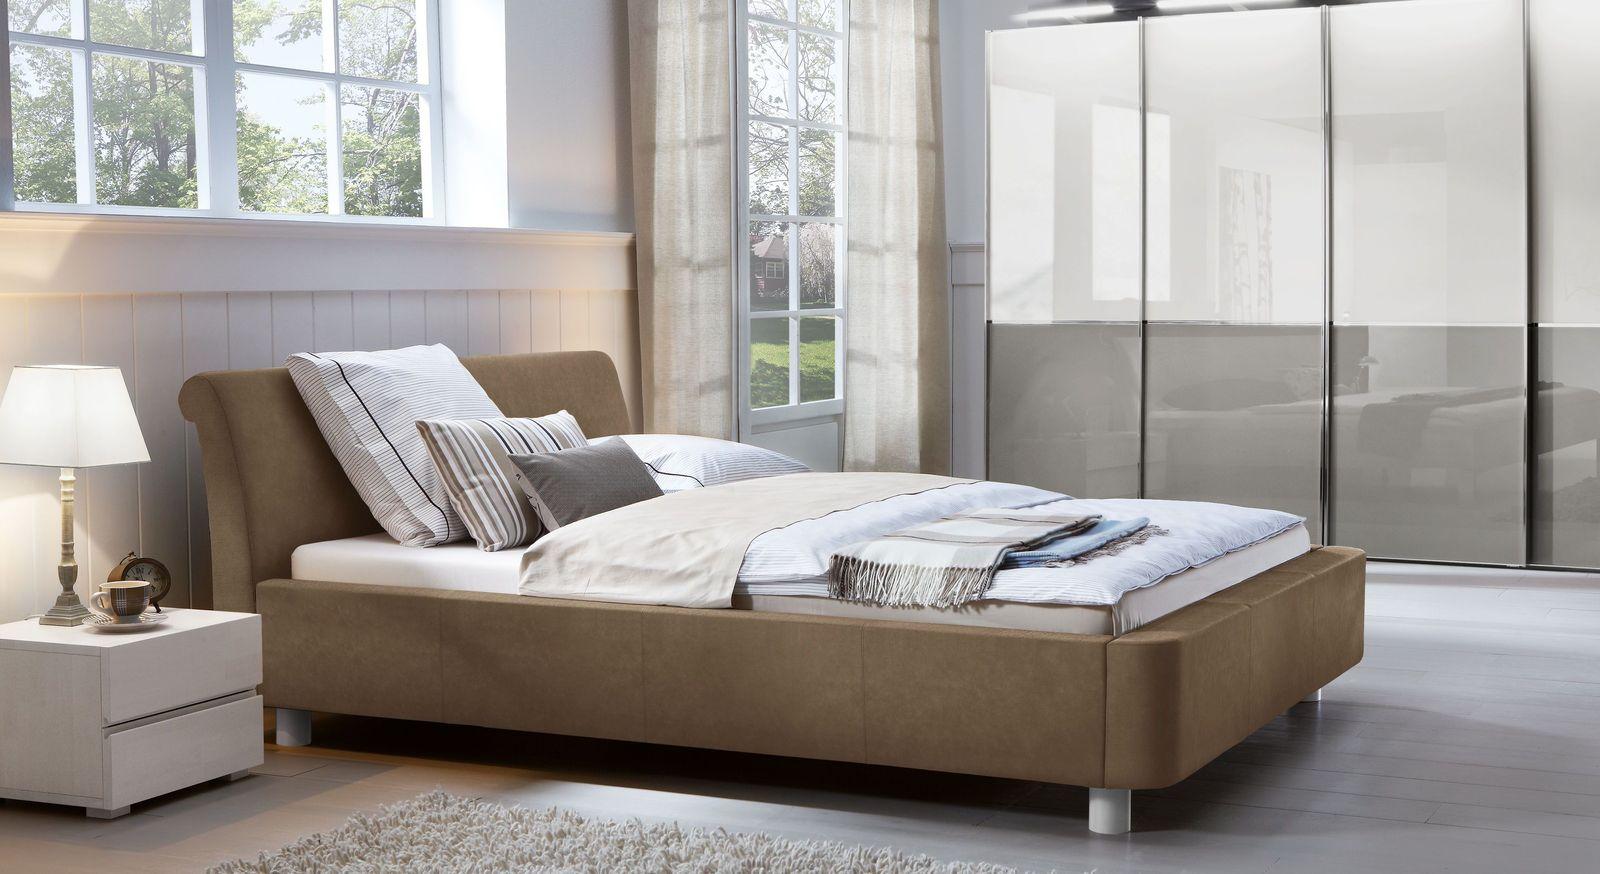 Komplett-Schlafzimmer Macuma mit bequemem Polsterbett